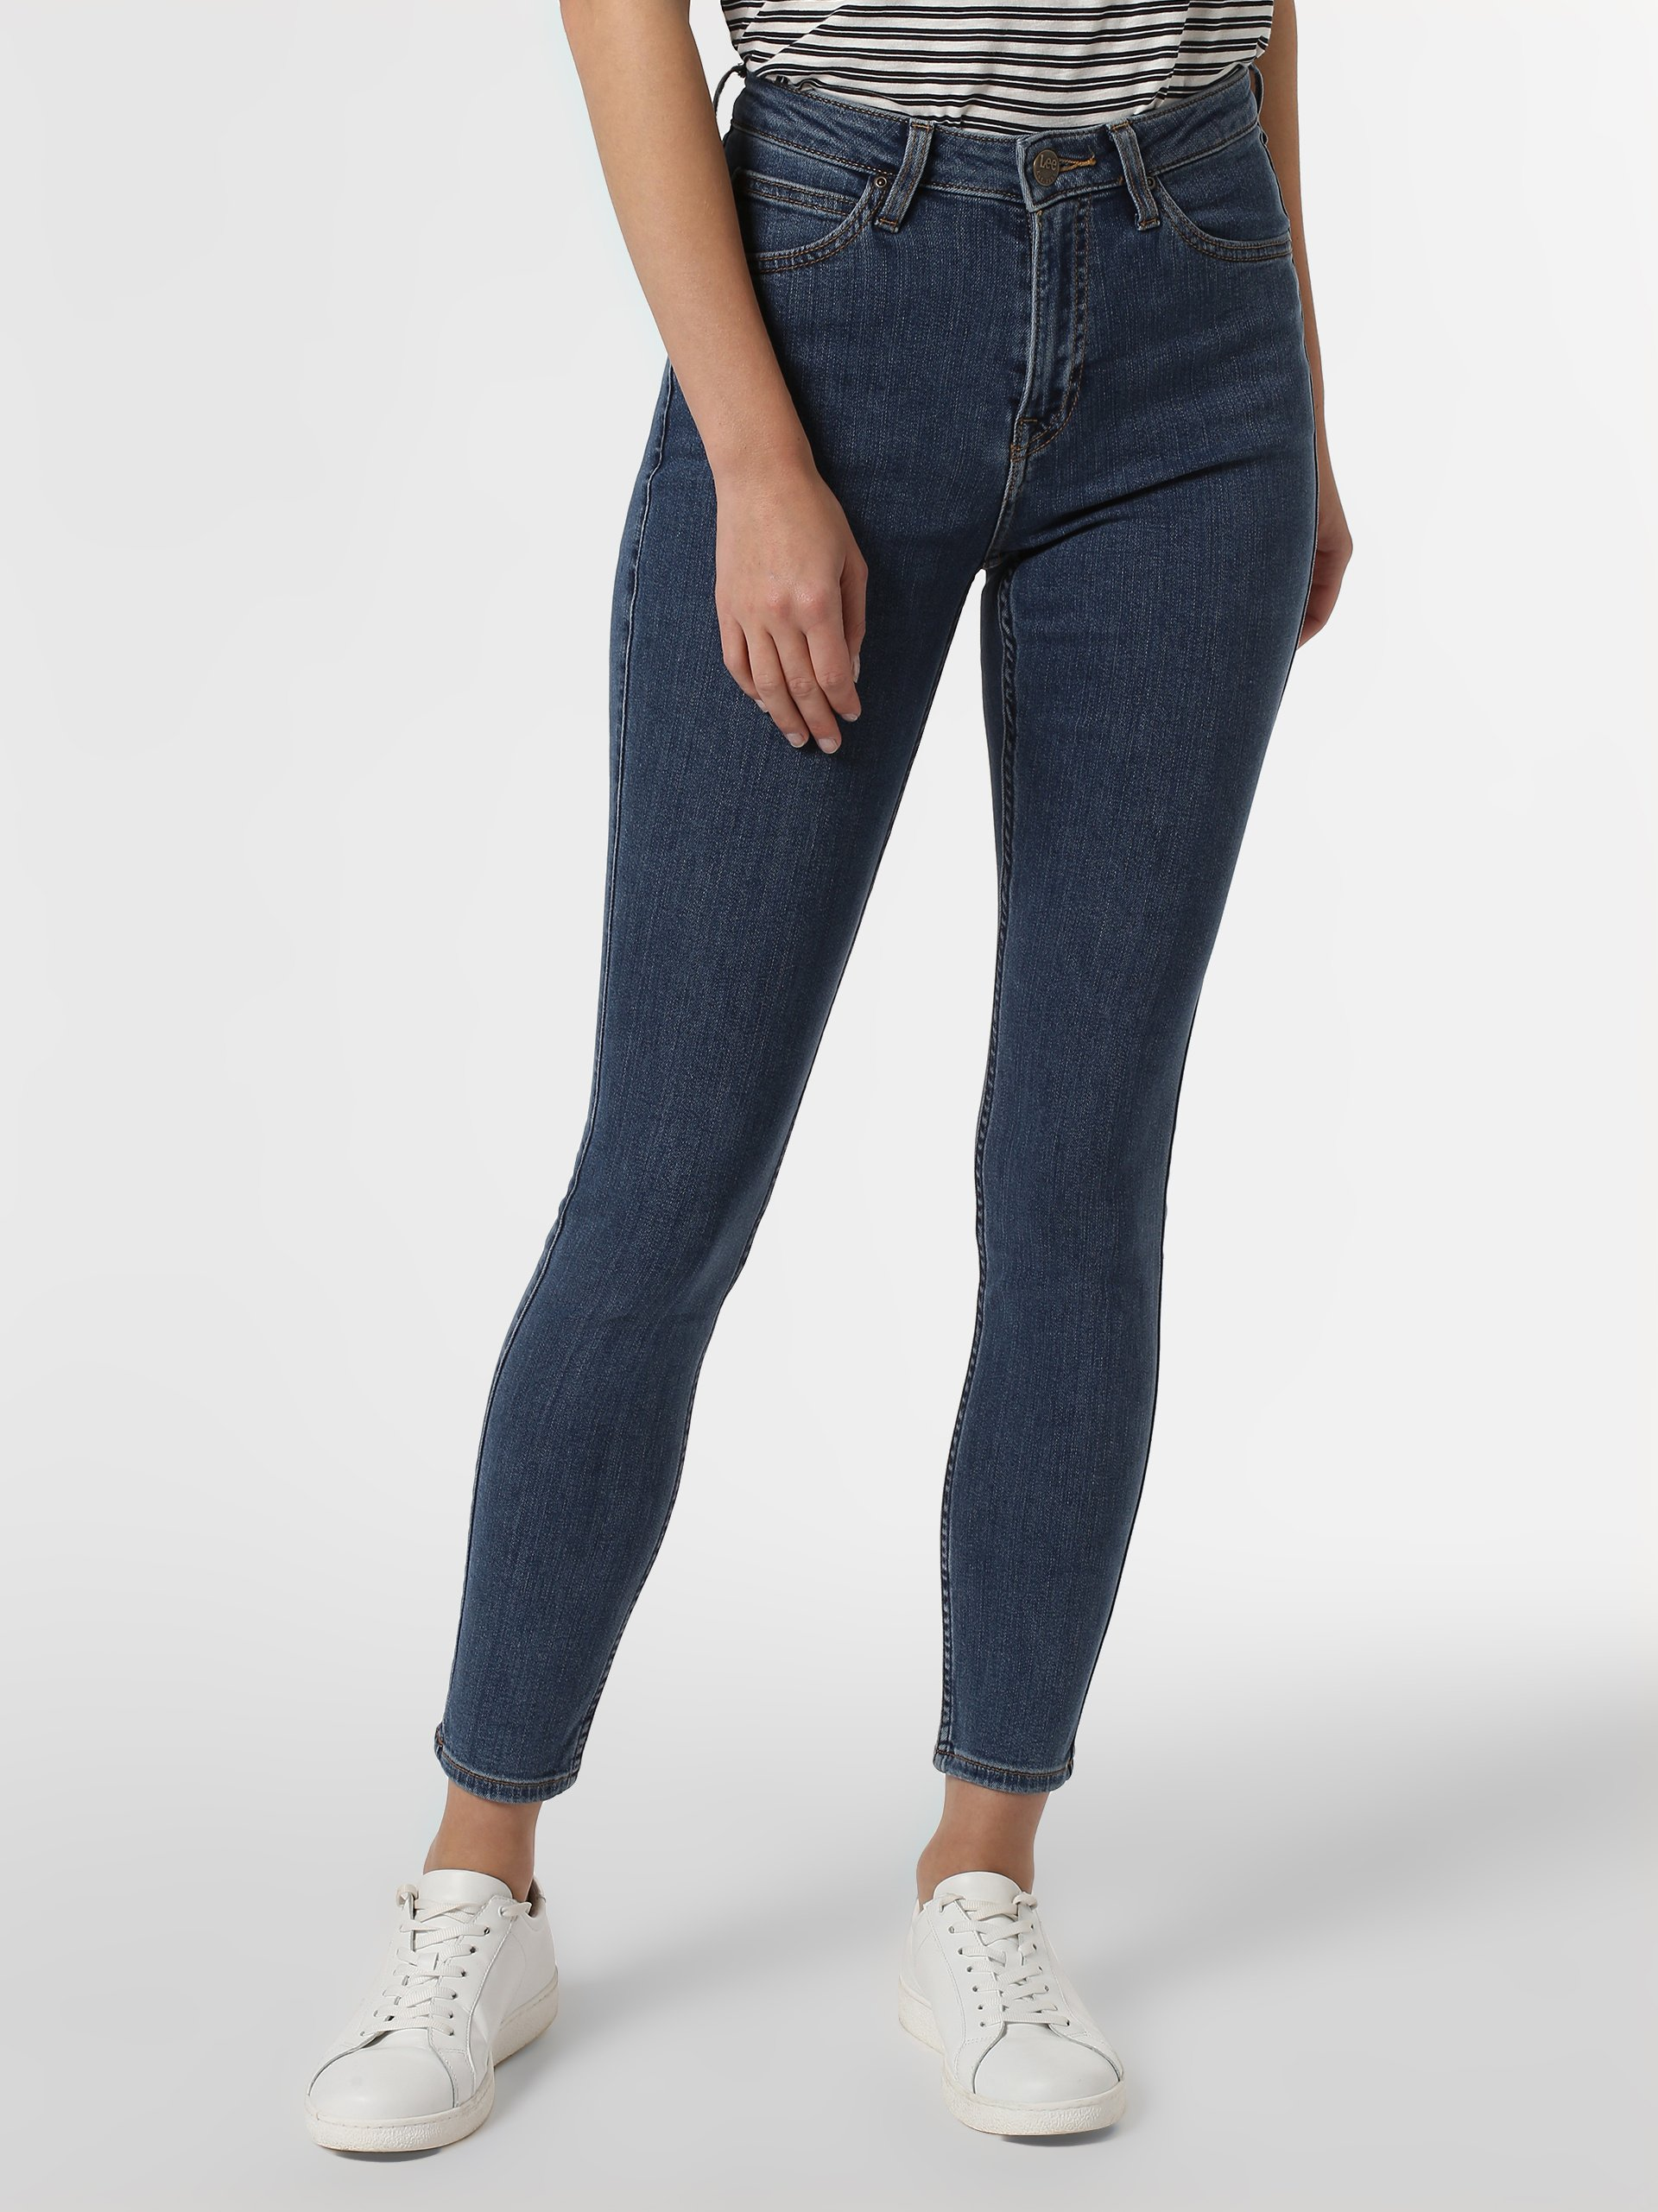 Lee Damen Jeans - Ivy